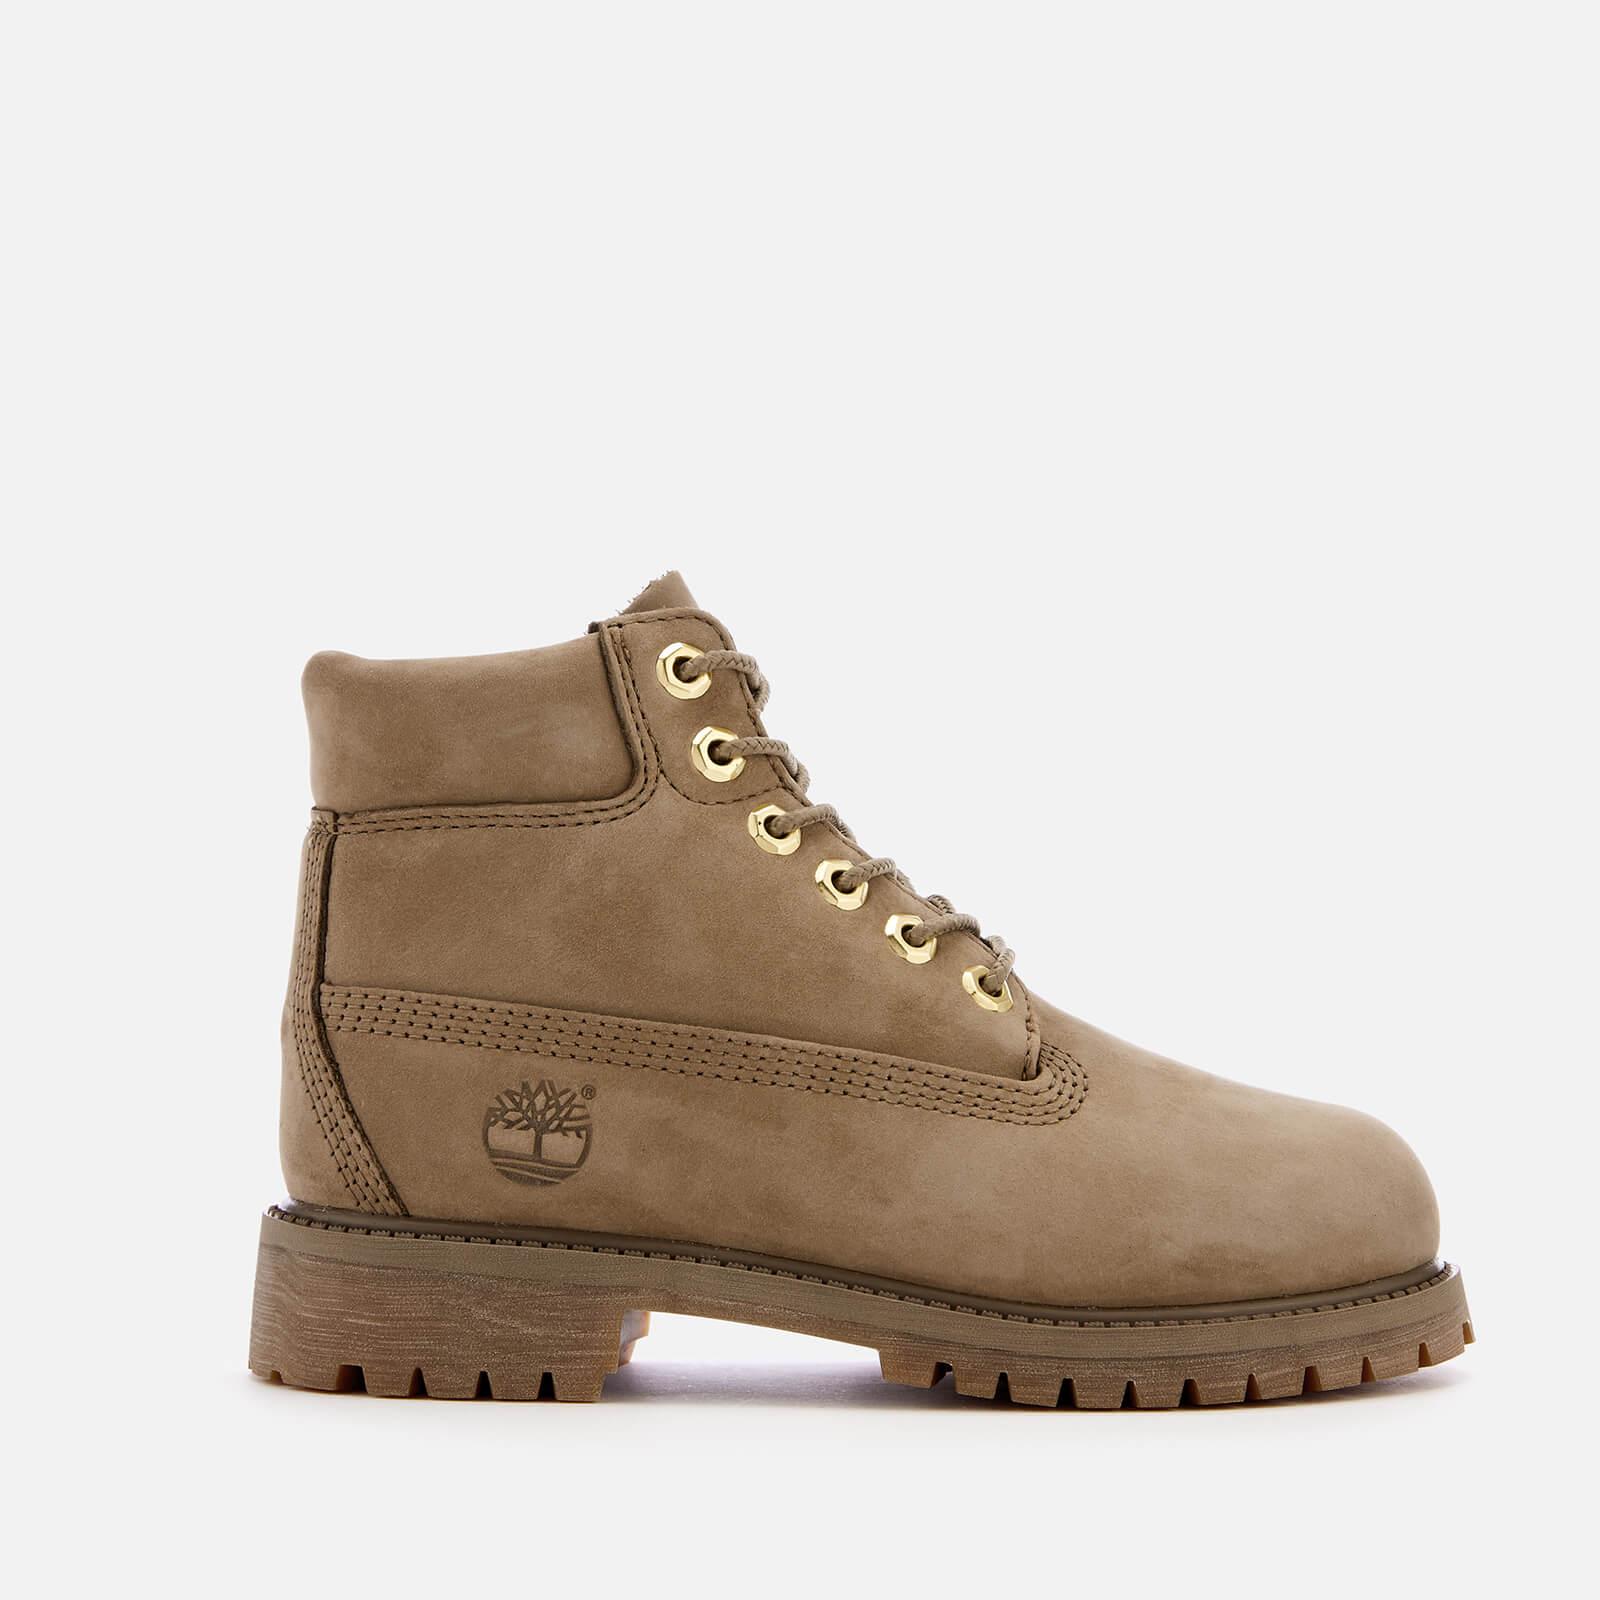 b7e86fb7796 Timberland Kids' 6 Inch Premium Waterproof Leather Boots - New Greige  Waterbuck Junior Clothing   TheHut.com